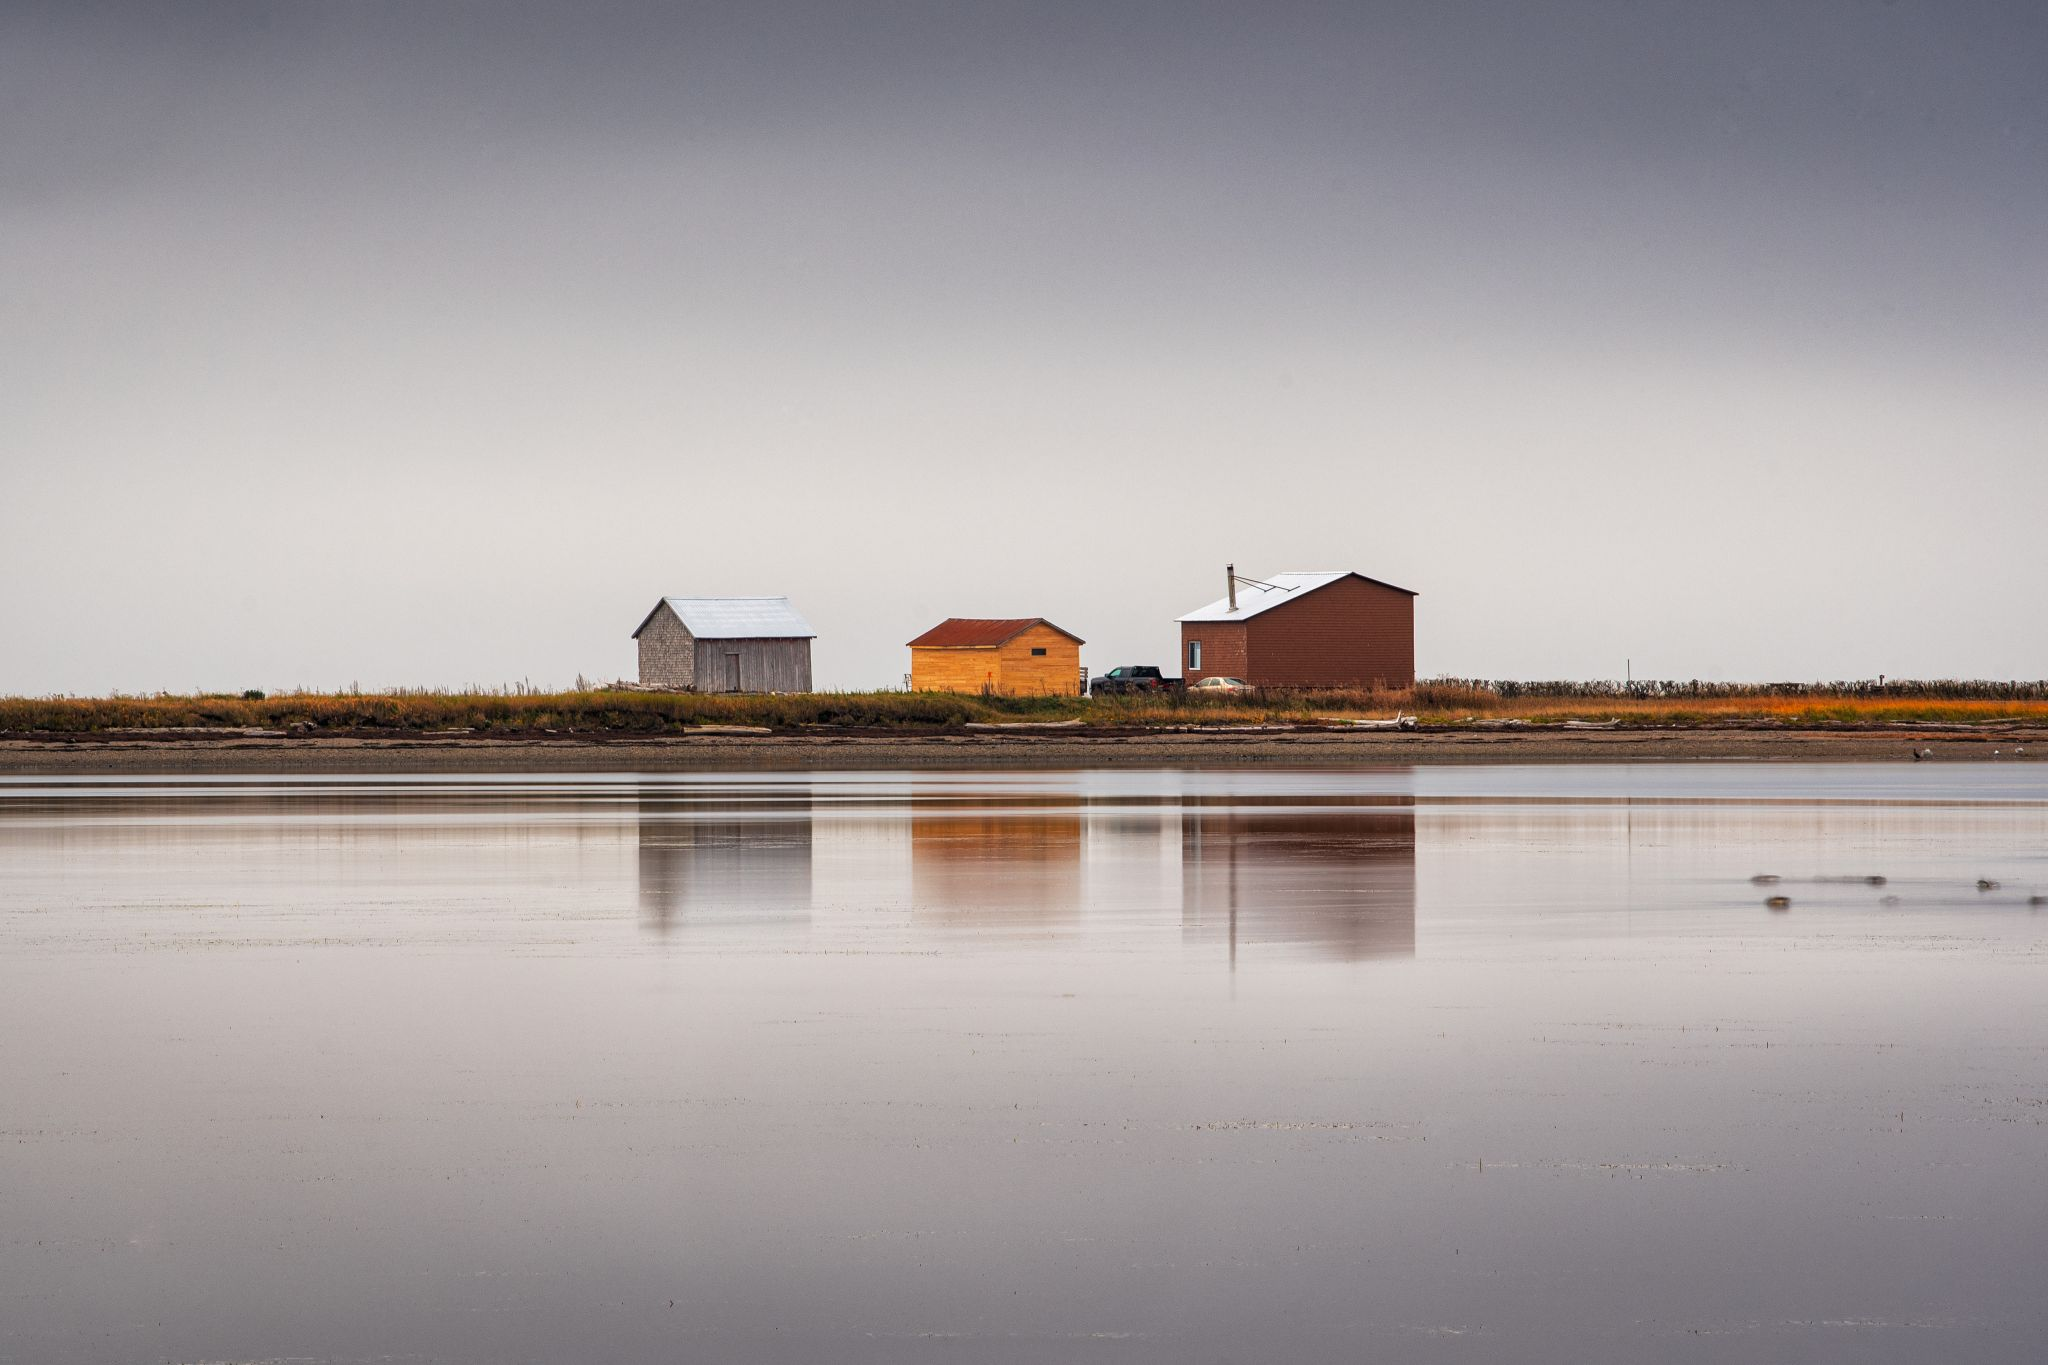 Laroque, Carlton-sur-mer, Gaspesie, Quebec, Canada, Canada